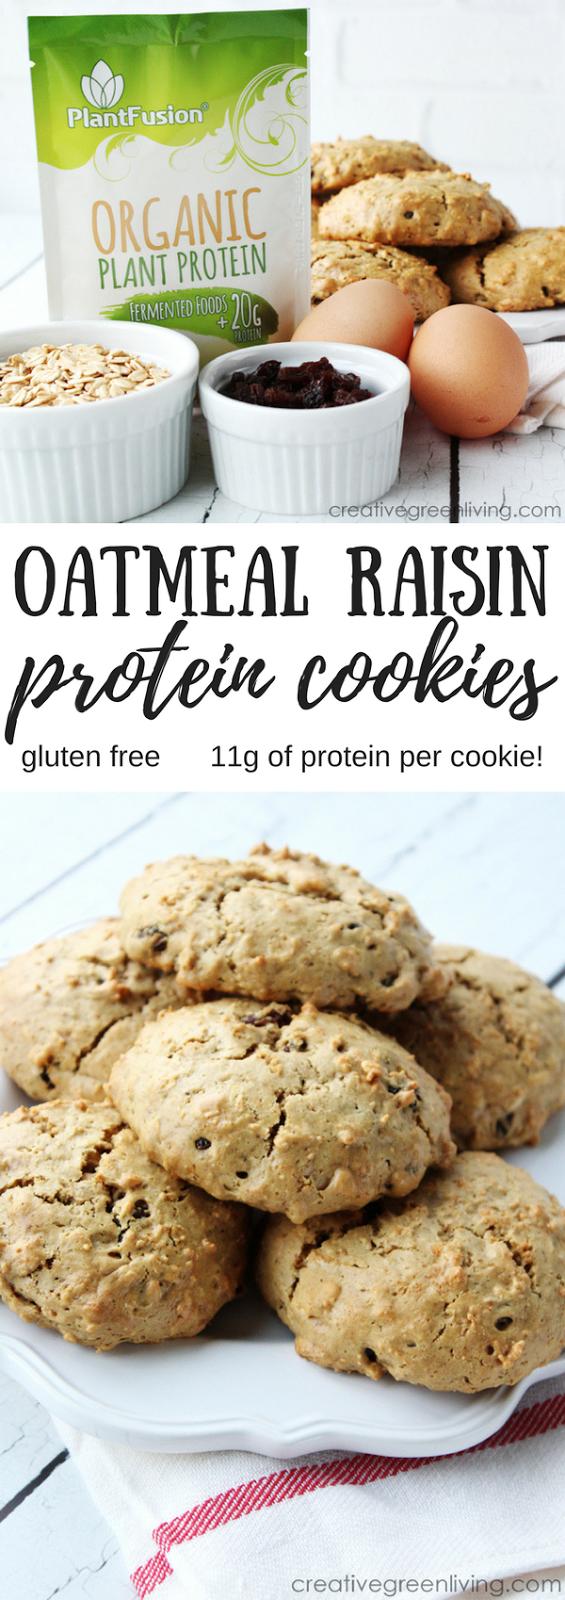 oatmeal raisin protein cookies recipe